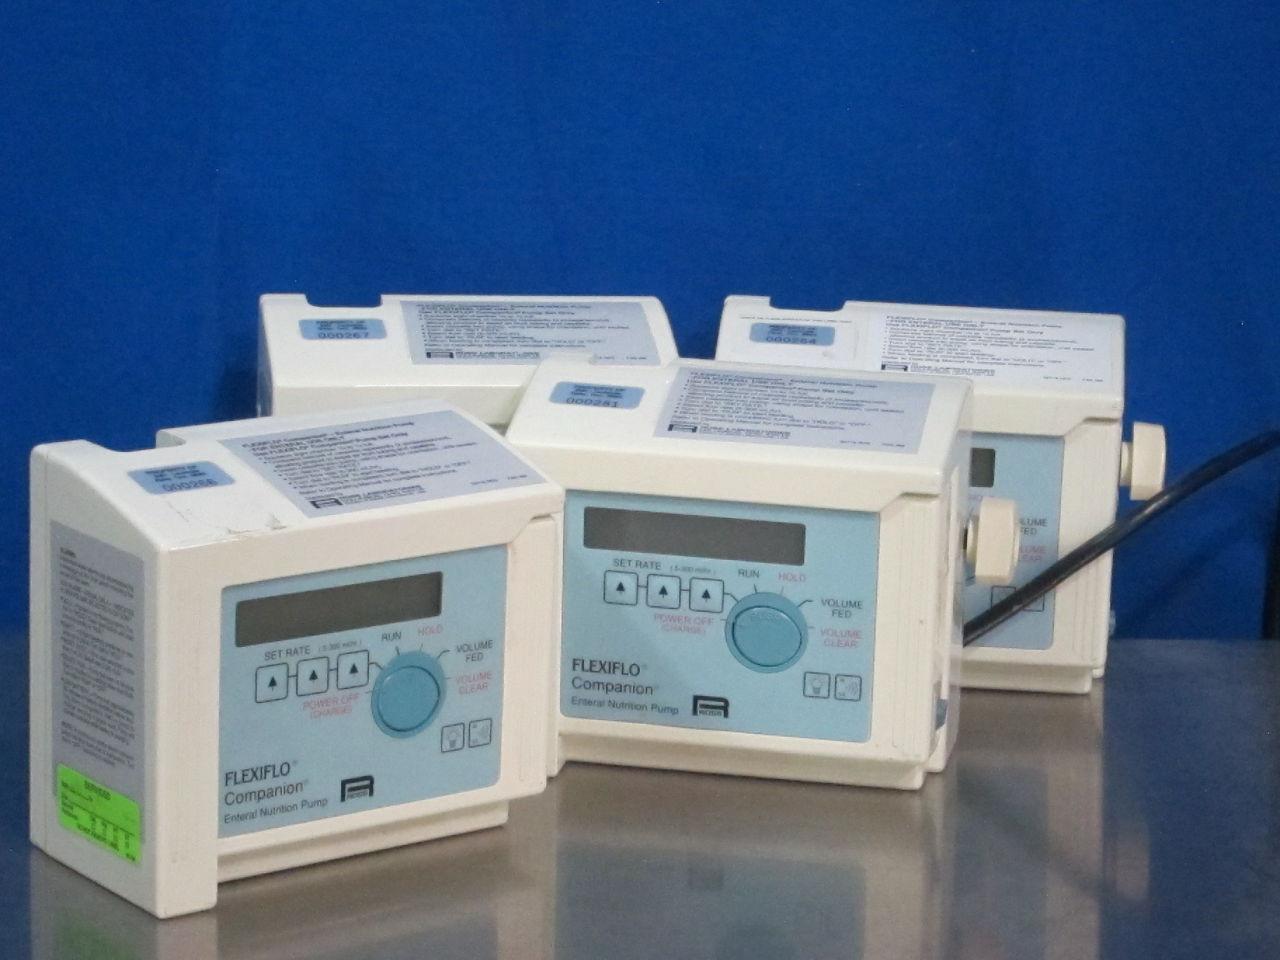 ROSS Flexiflo Companion  - Lot of 4 Feeding Pump